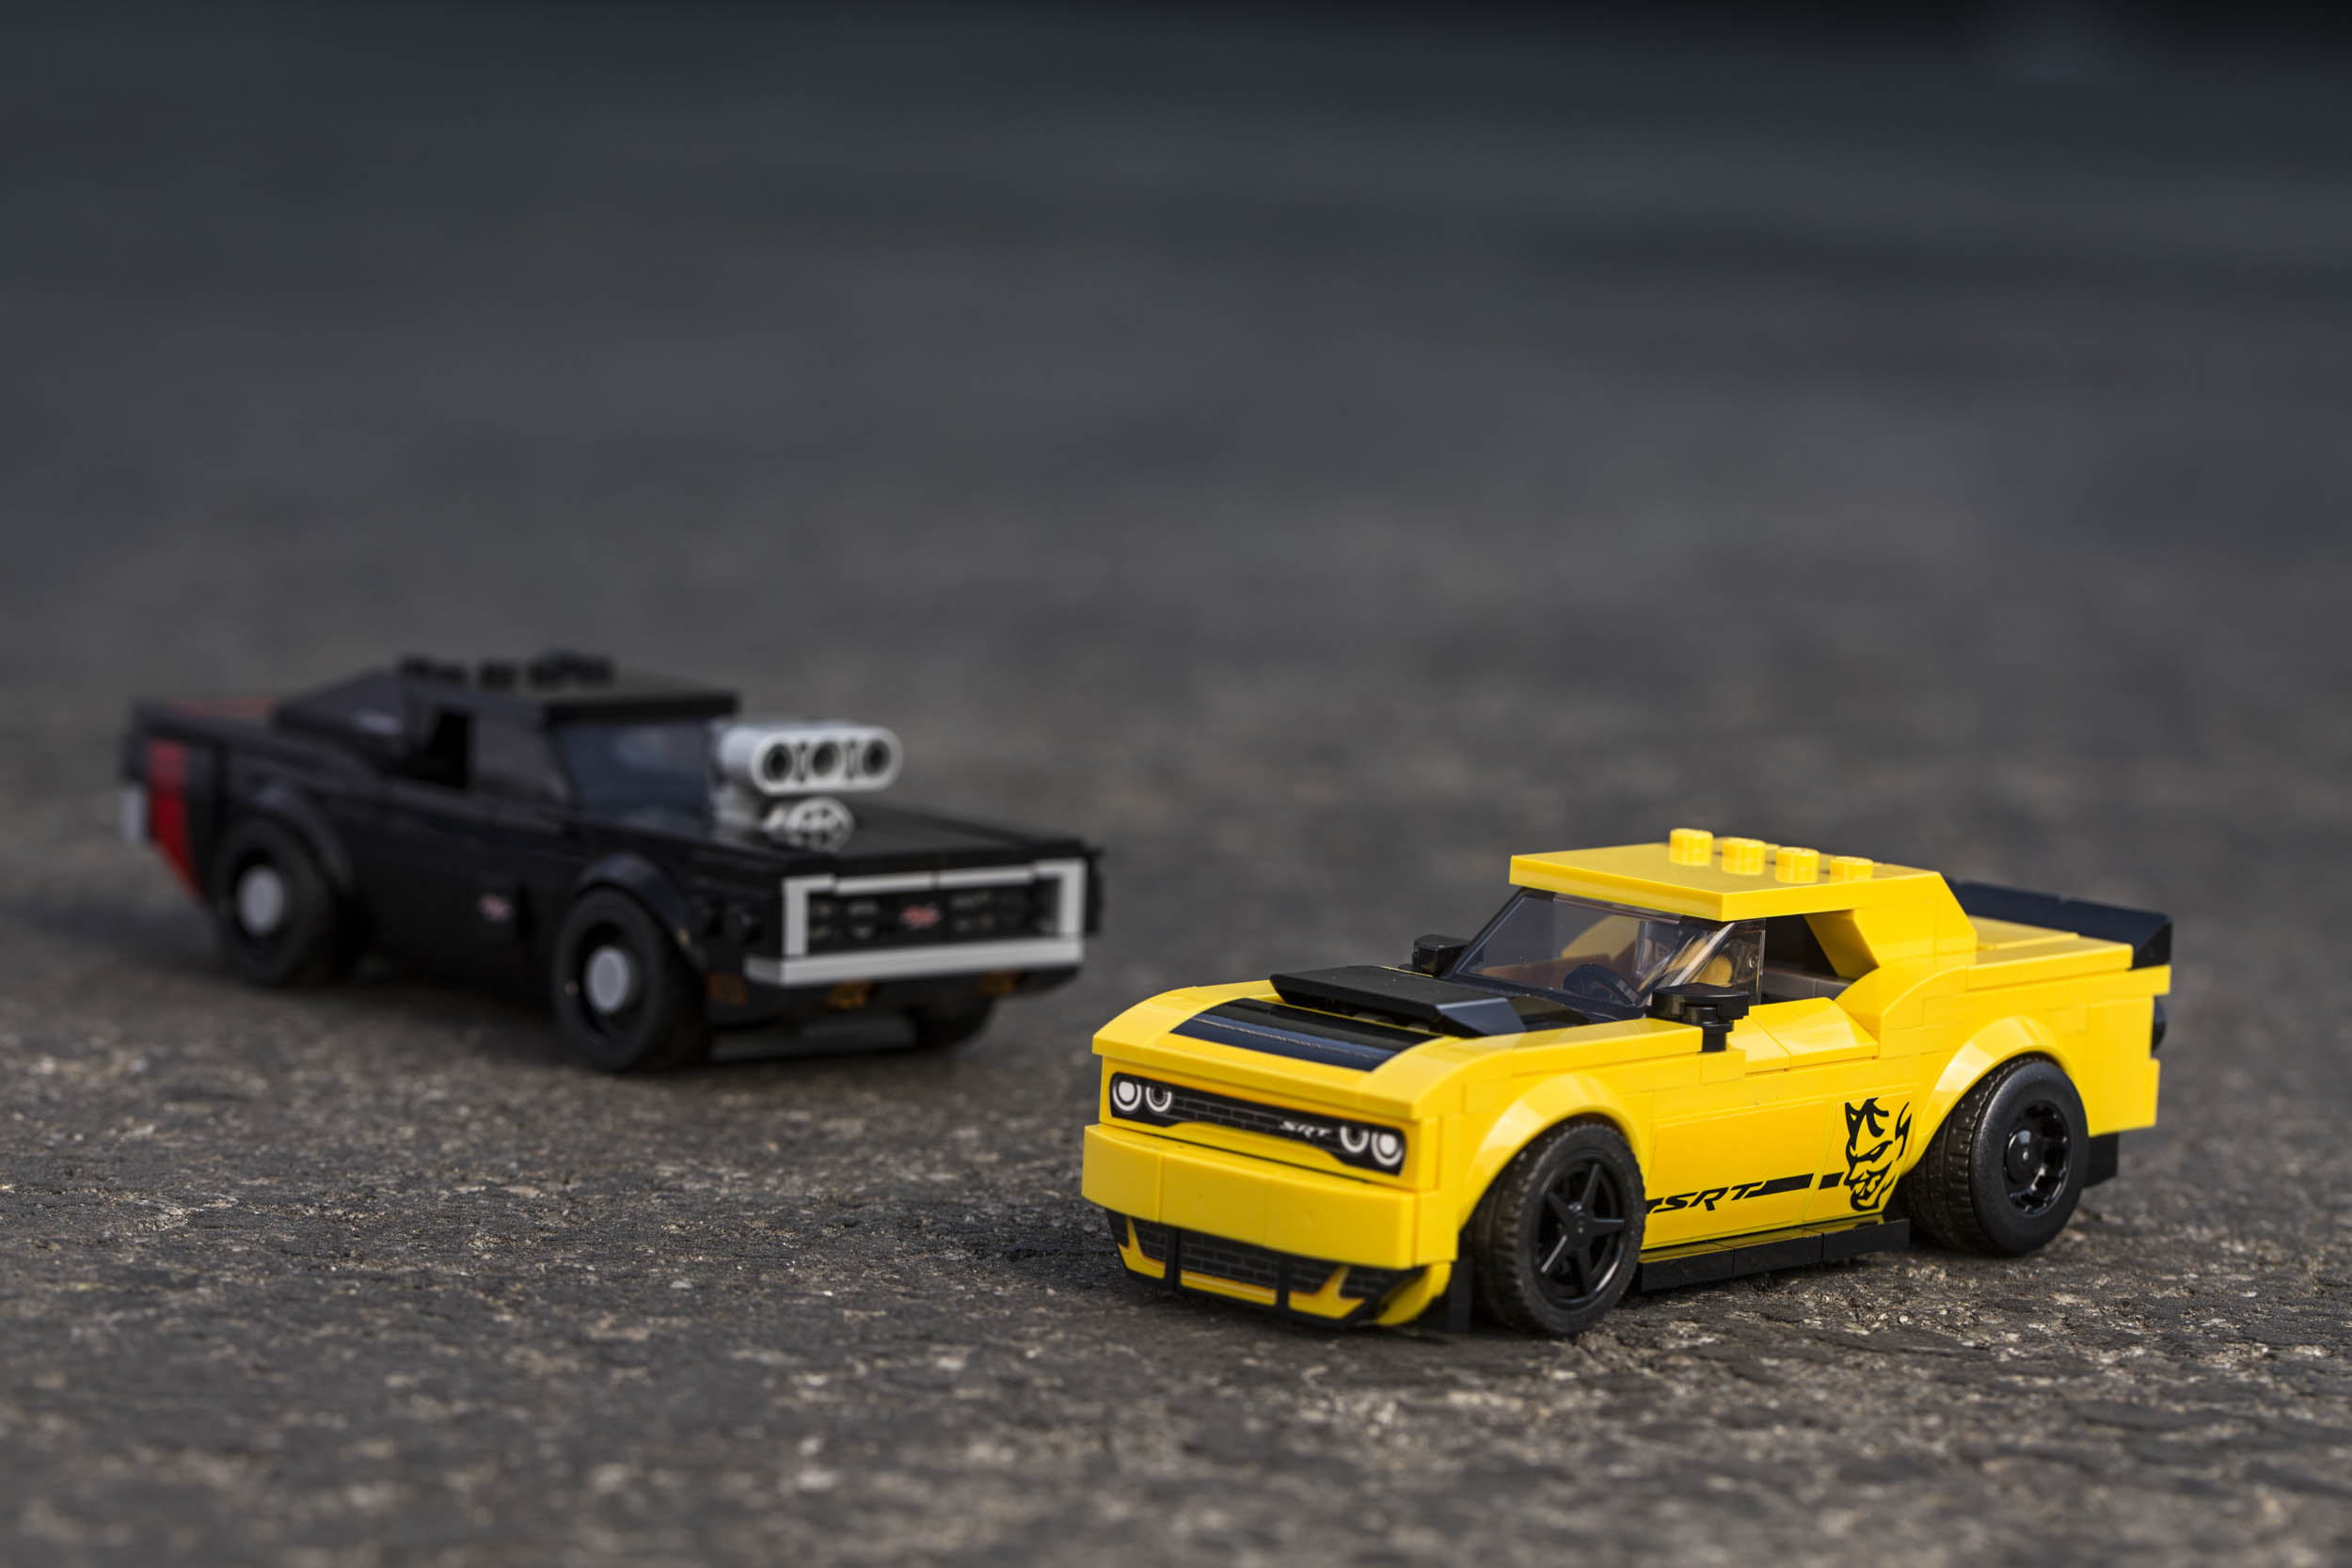 LEGO-Dodge partnership makes Demon ownership affordable thumbnail